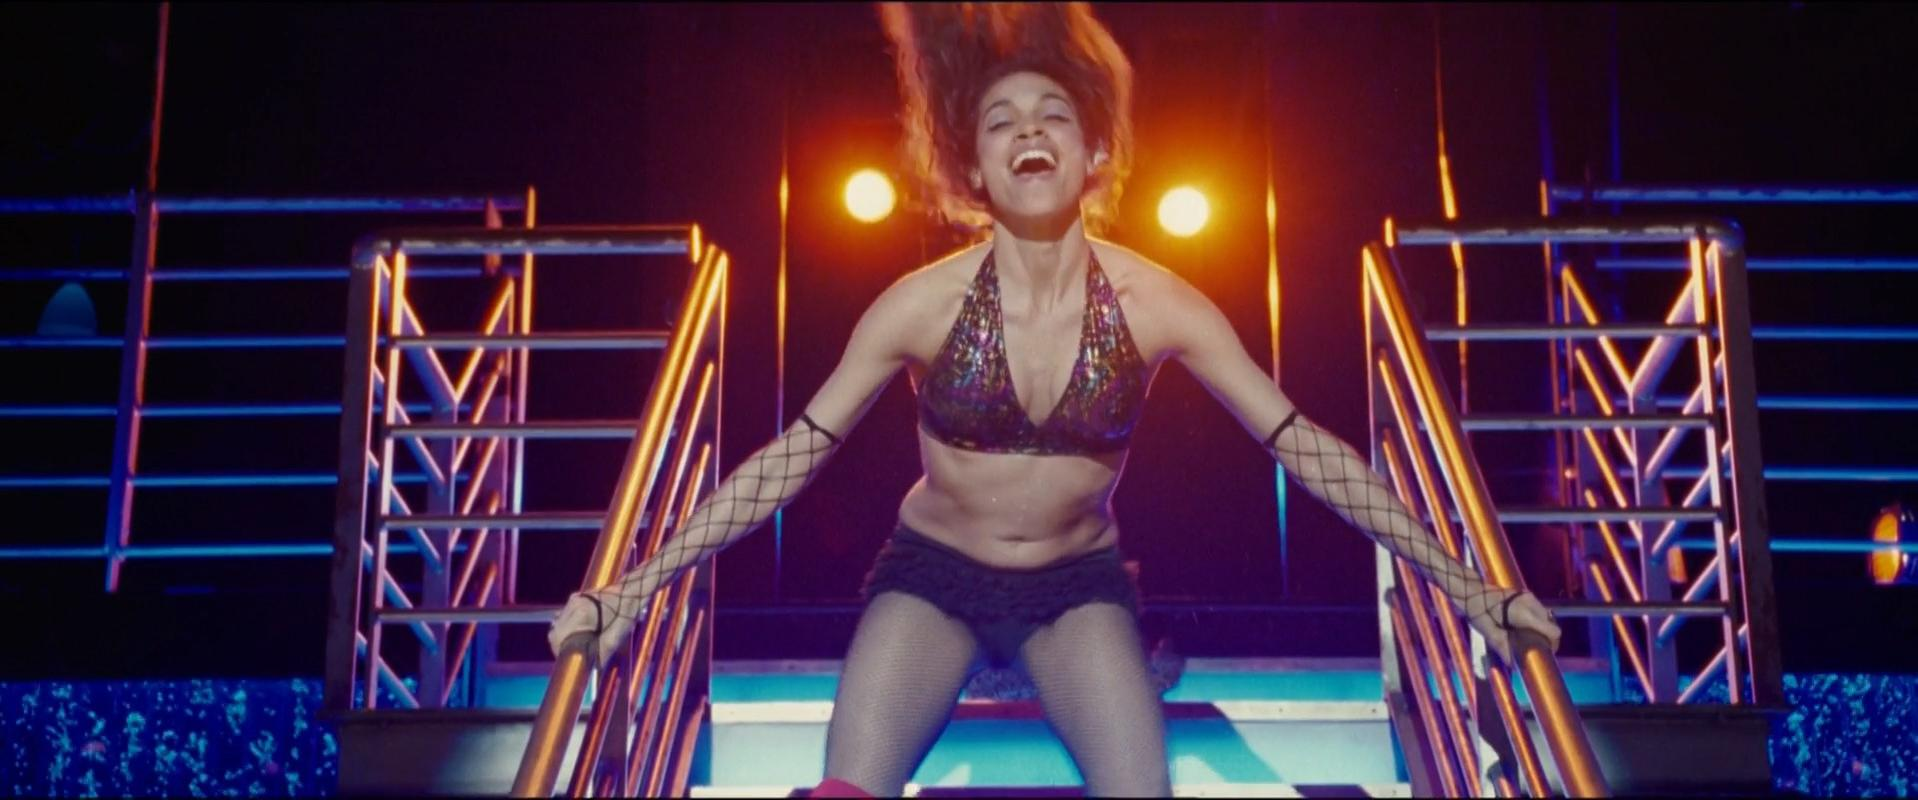 Rosario Dawson sexy, Idina Menzel nude - Rent (2005)